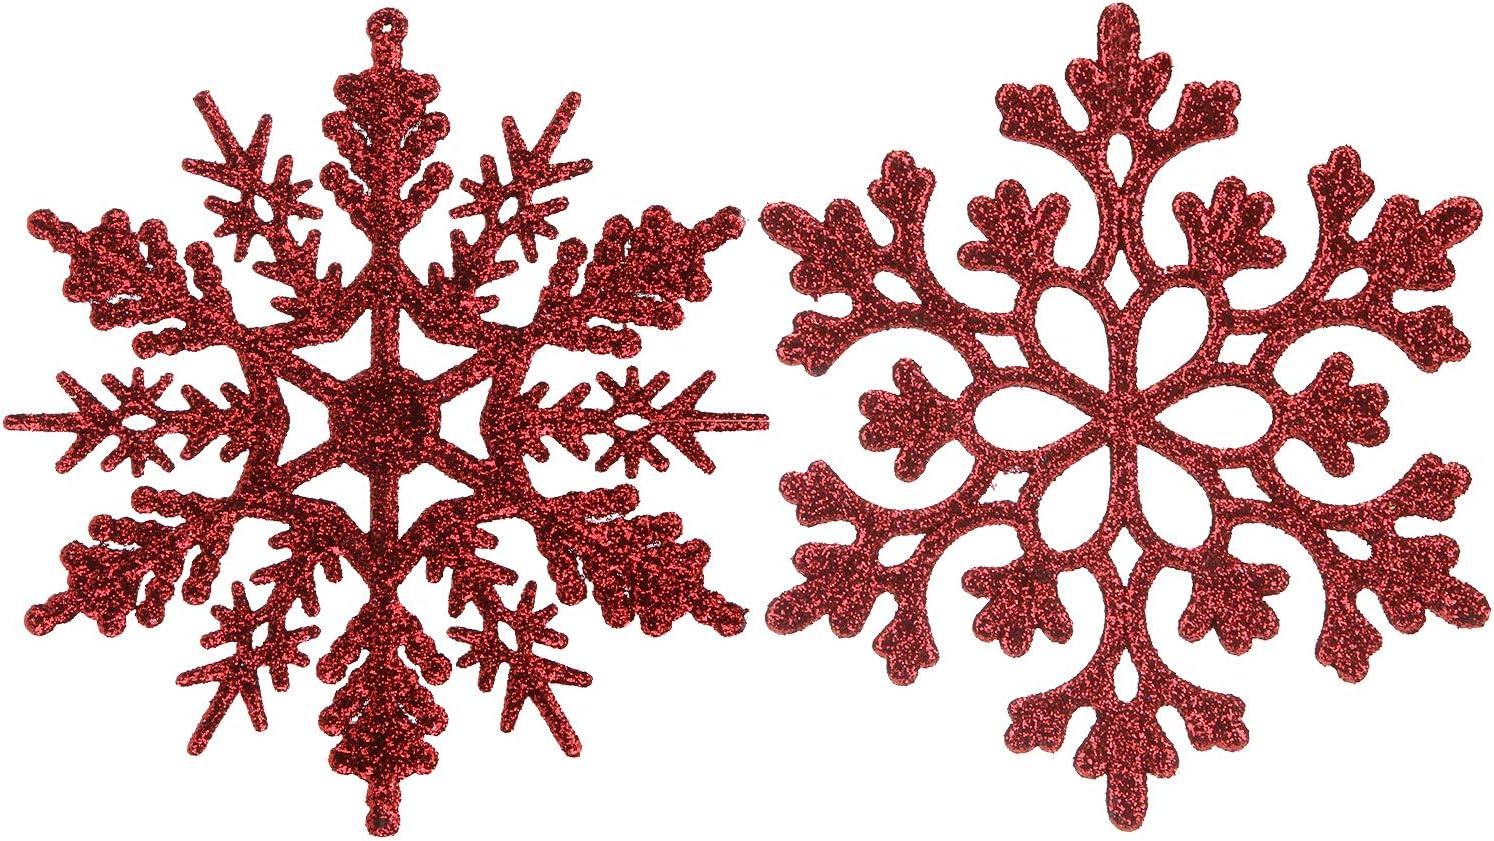 Sea Team Plastic Christmas Glitter Snowflake Ornaments Christmas Tree Decorations, 4-inch, Set of 36, Burgundy